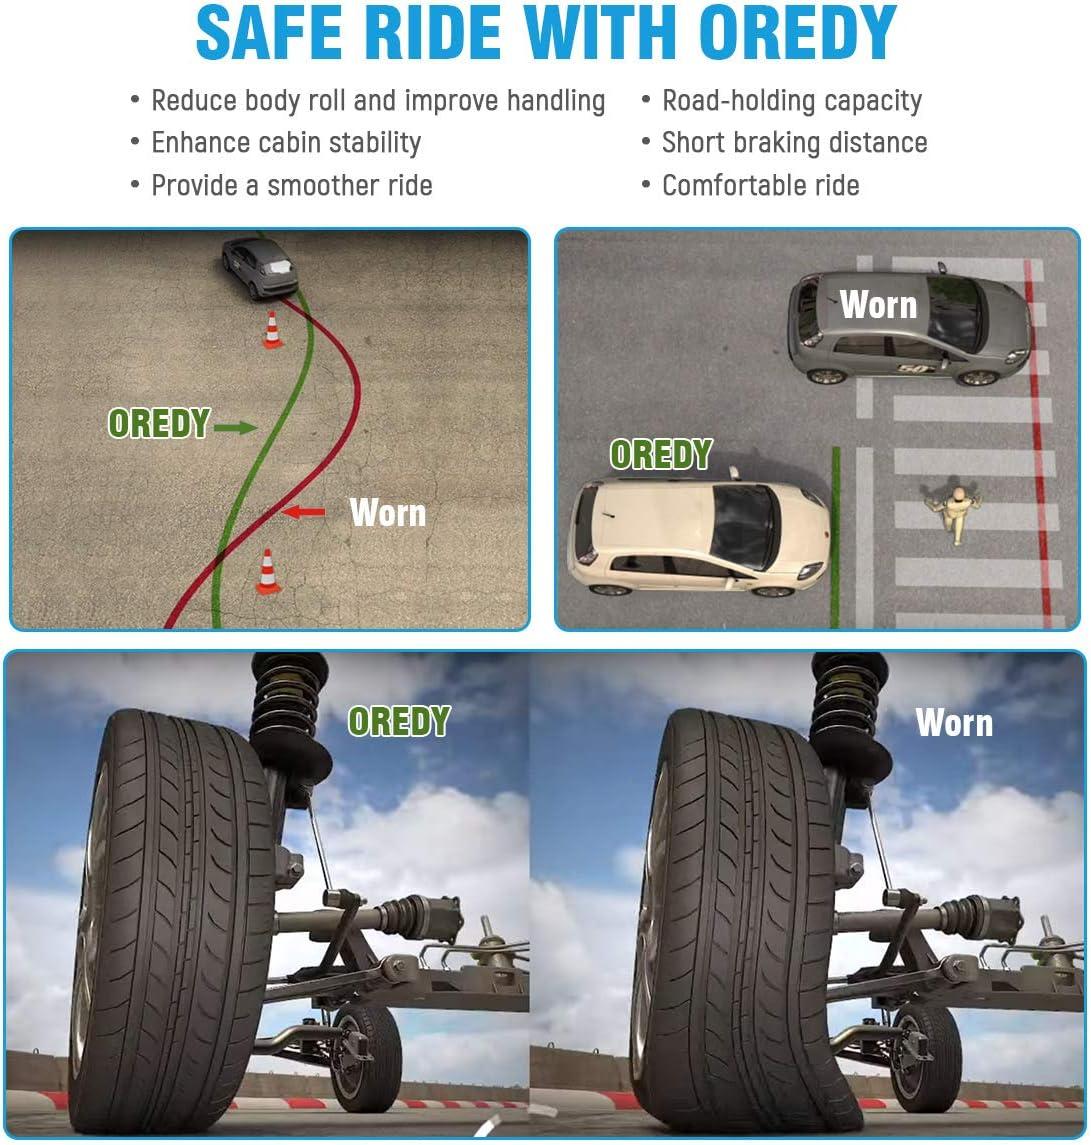 OREDY Front Struts 2PCS Driver and Passenger Side Complete Struts Shocks Coil Spring Assembly 11373 11374 827213 827214 Suspension Struts